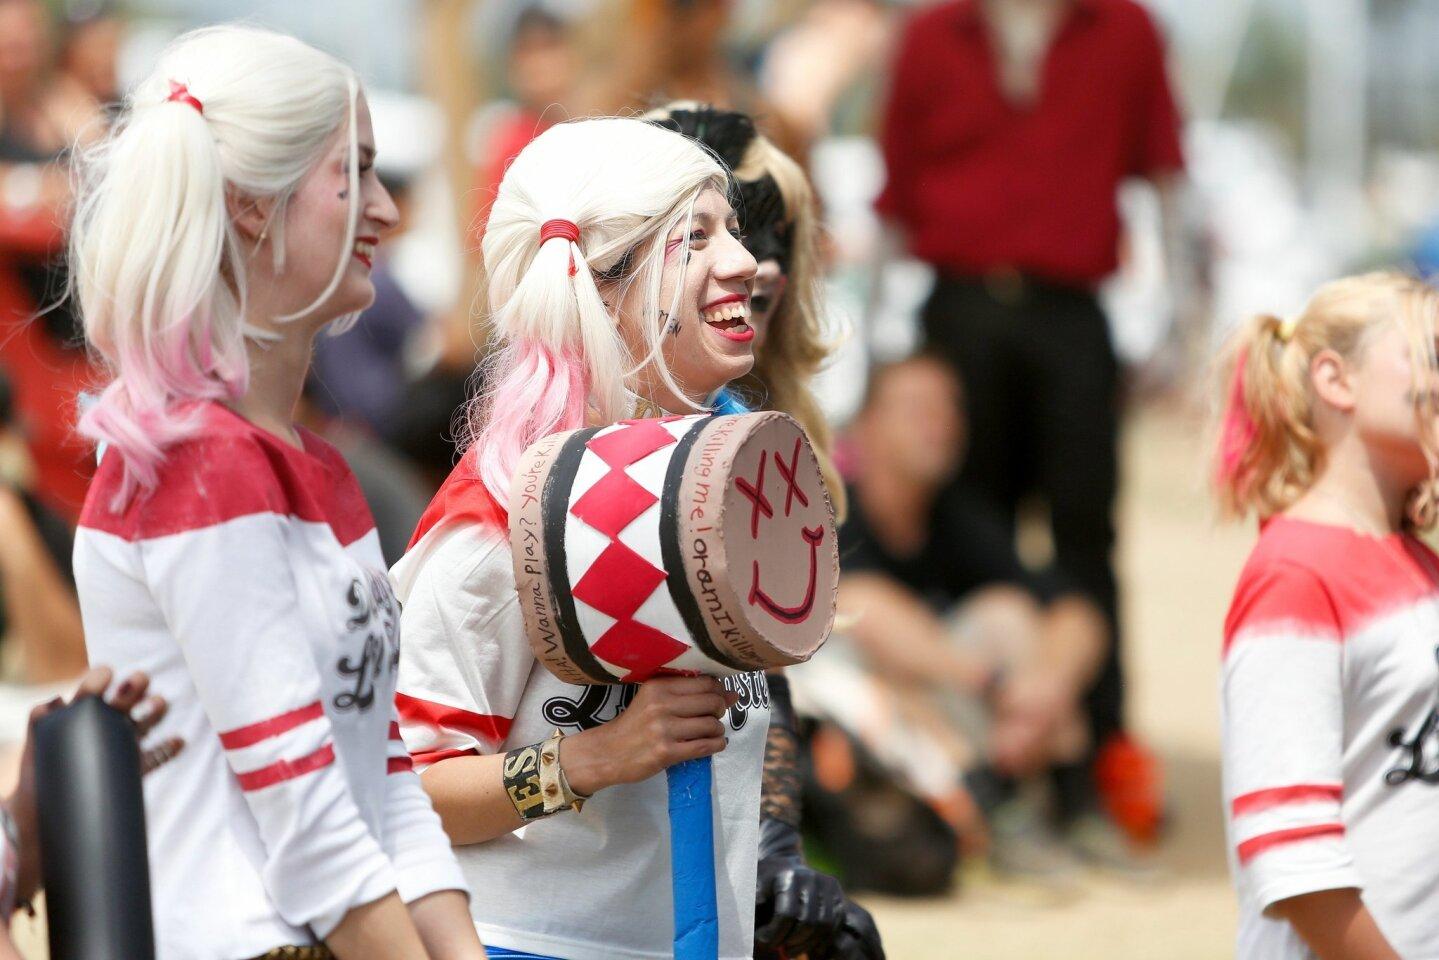 Harley Quinn costume contest